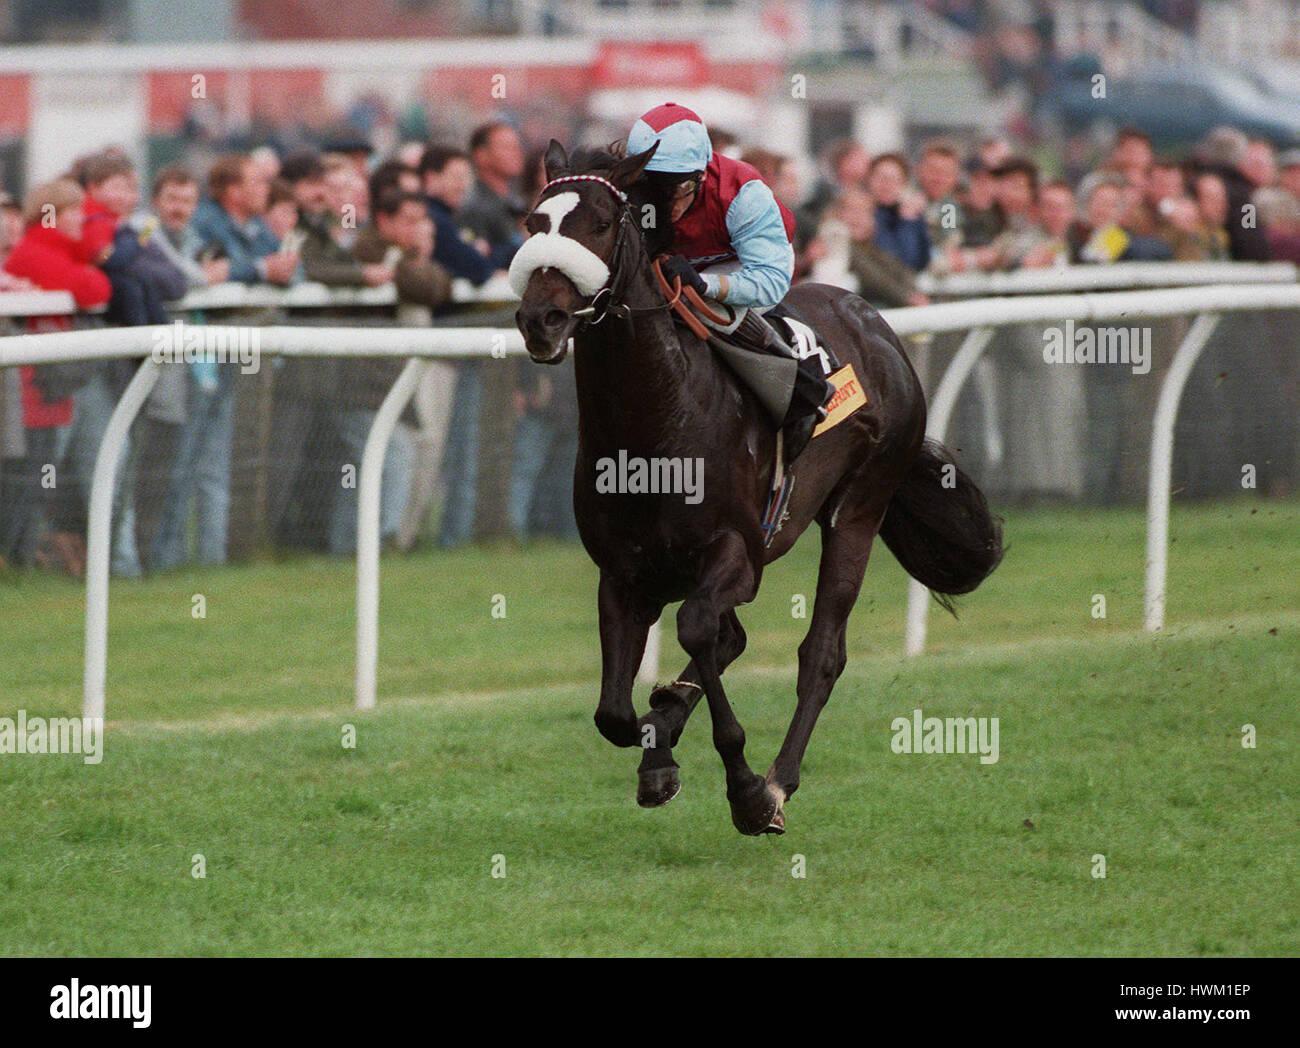 CELTIC SWING gagne 95 GREENHAM MONTÉ PAR KEVIN DARLEY 25 Avril 1995 Photo Stock